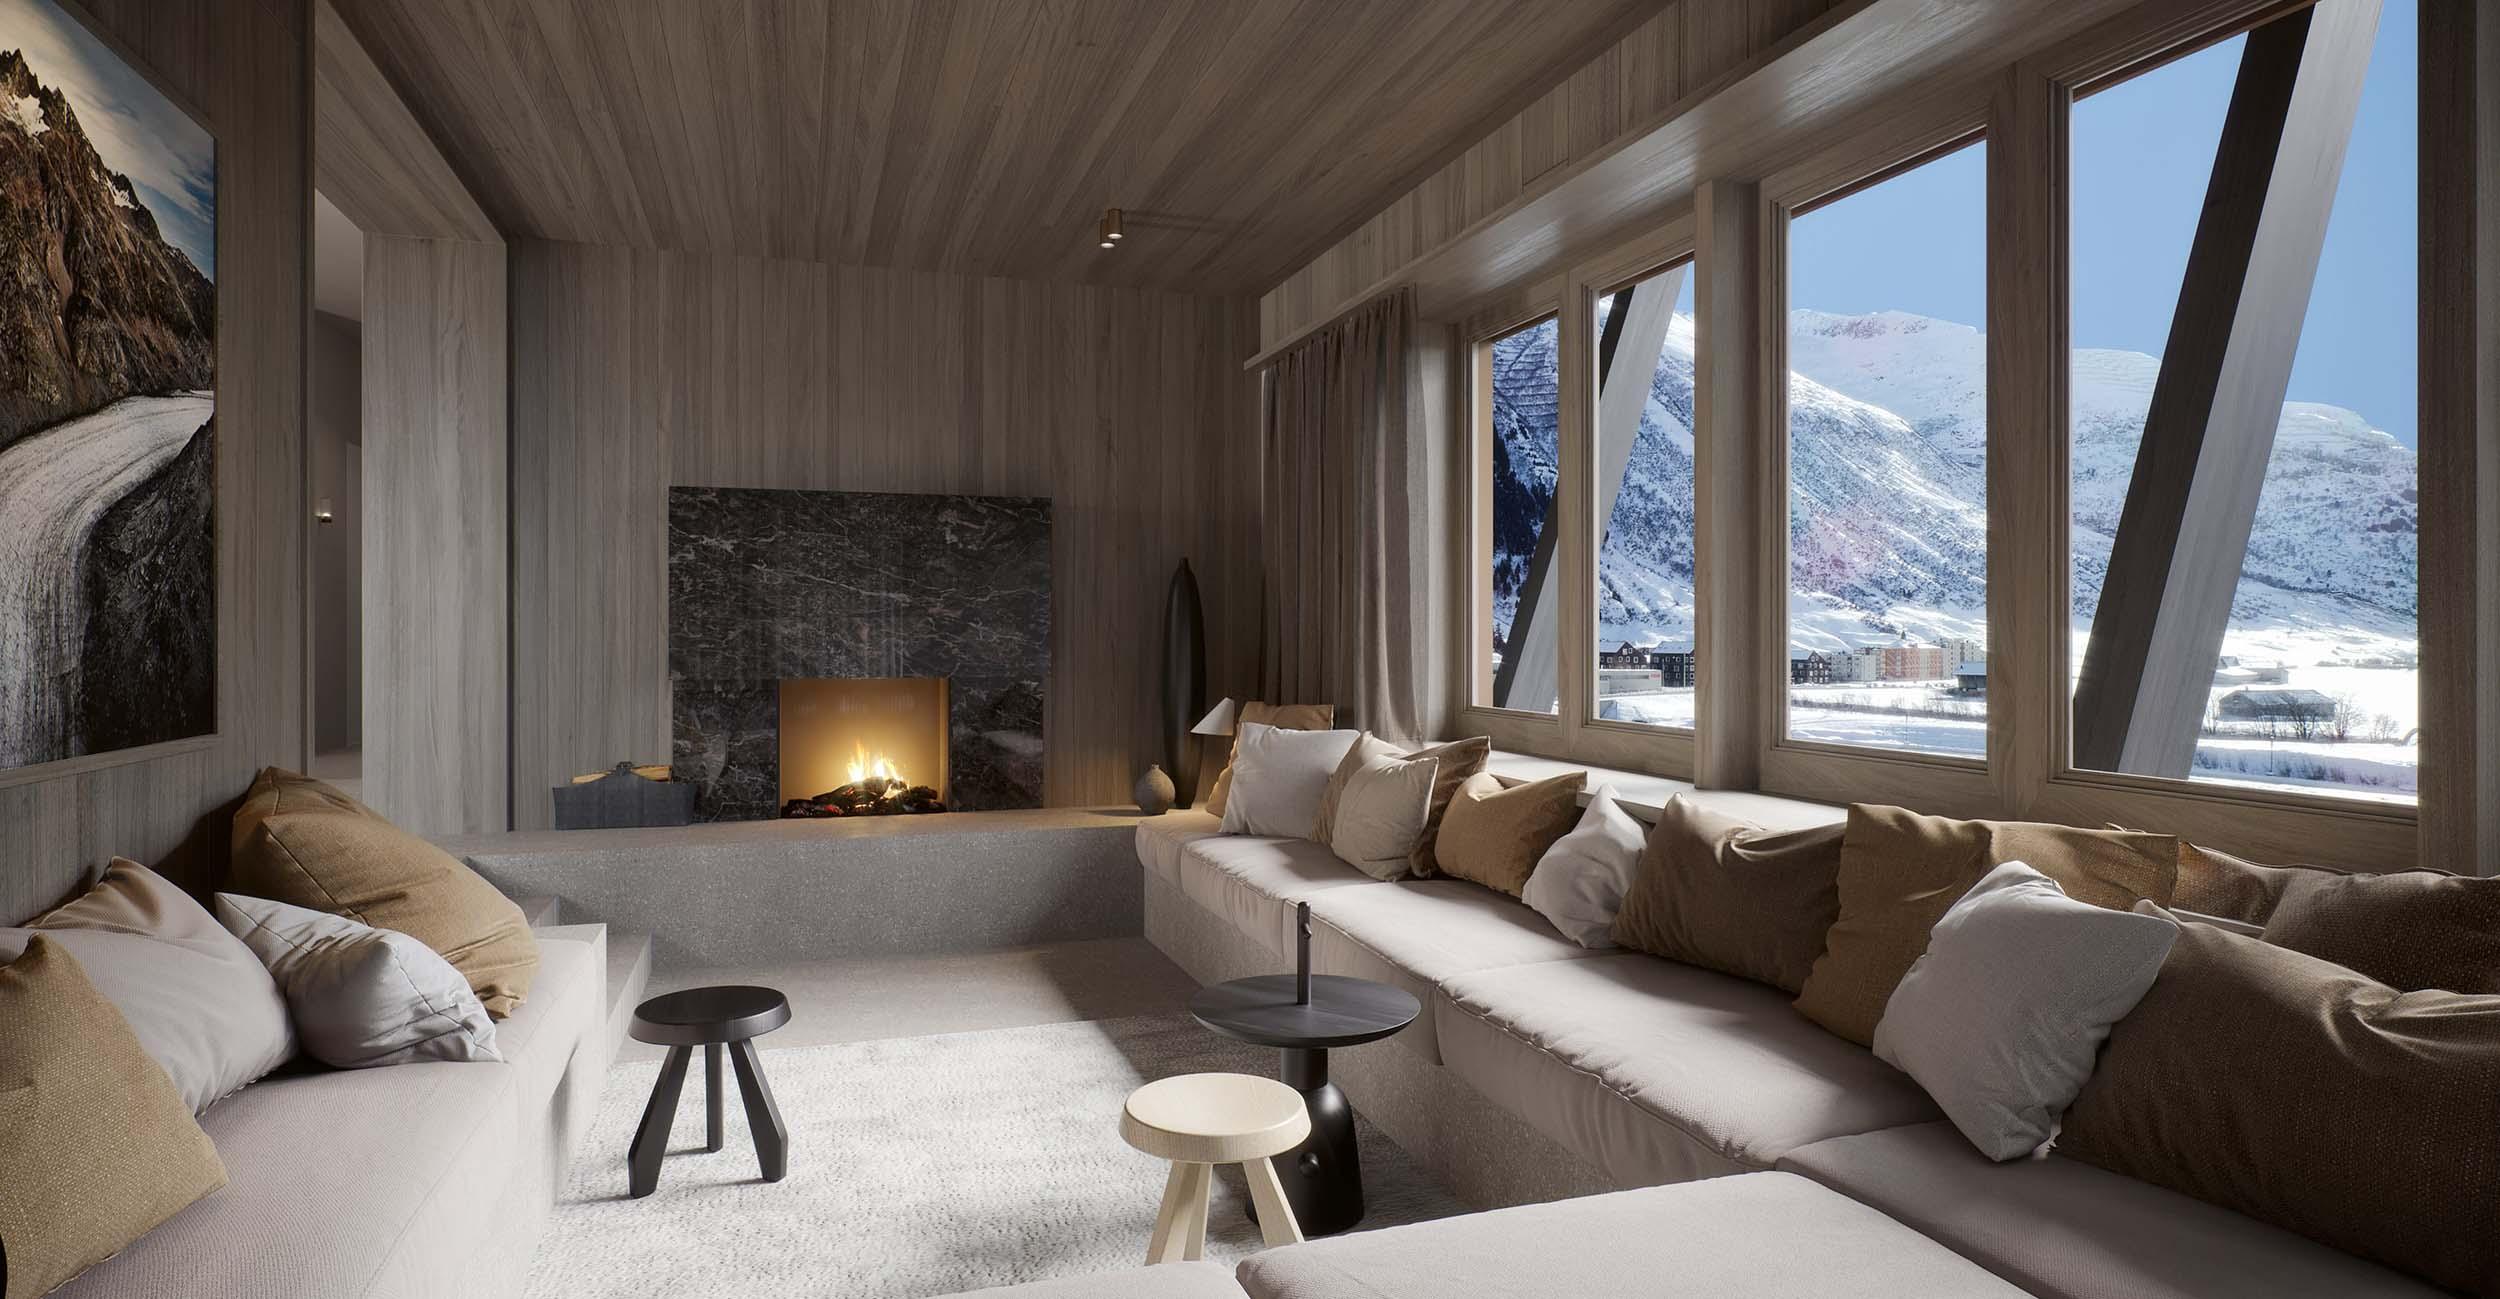 House Alma Apartments, Switzerland